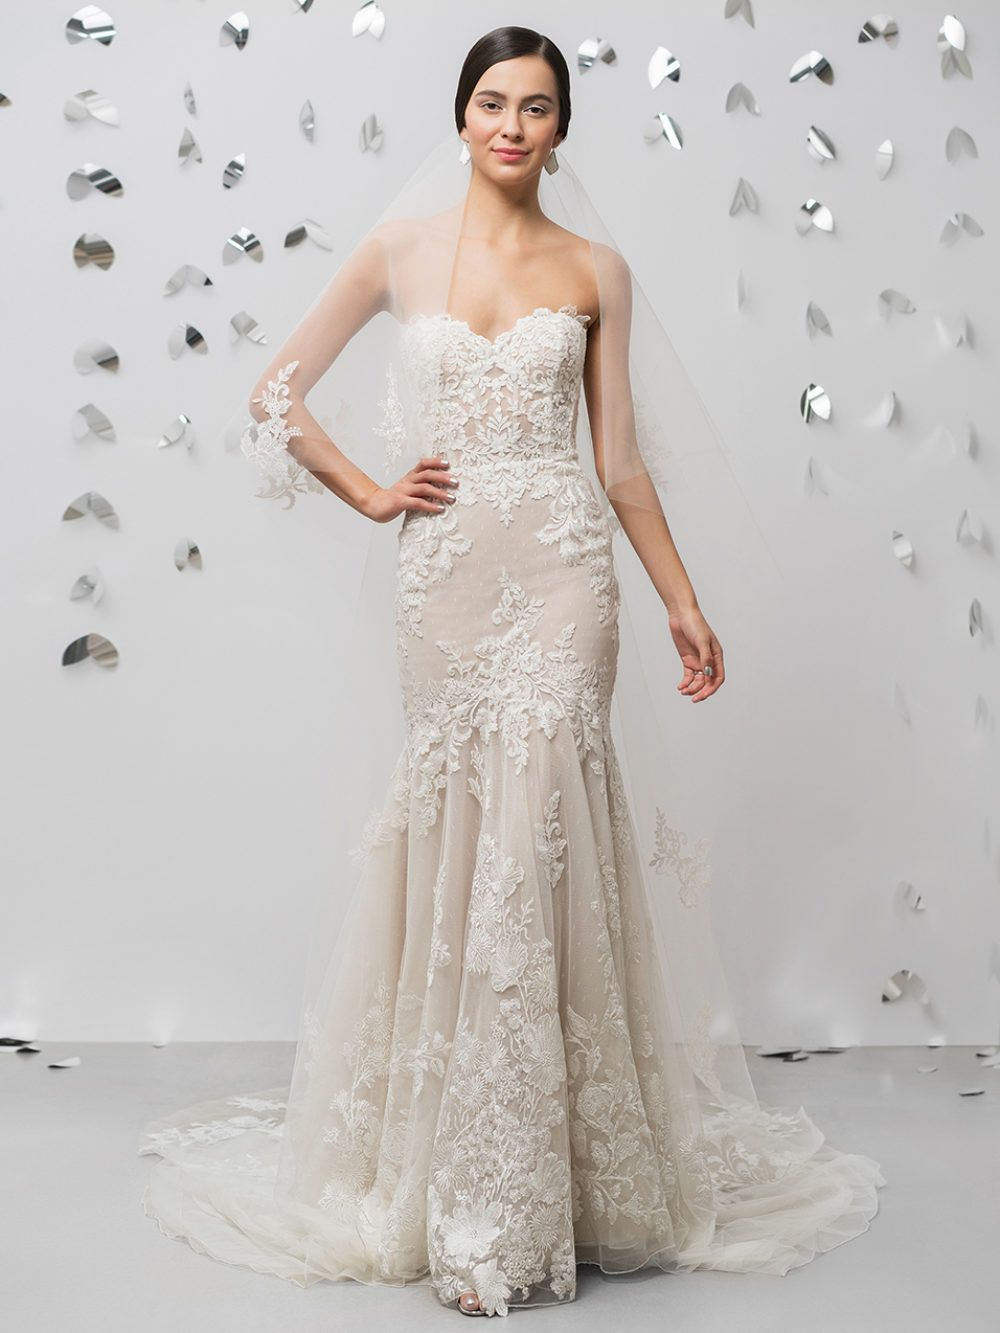 99007 By Justin Alexander Wedding Dresses Justin Alexander Wedding Fit And Flare Wedding Dress Justin Alexander Wedding Dress